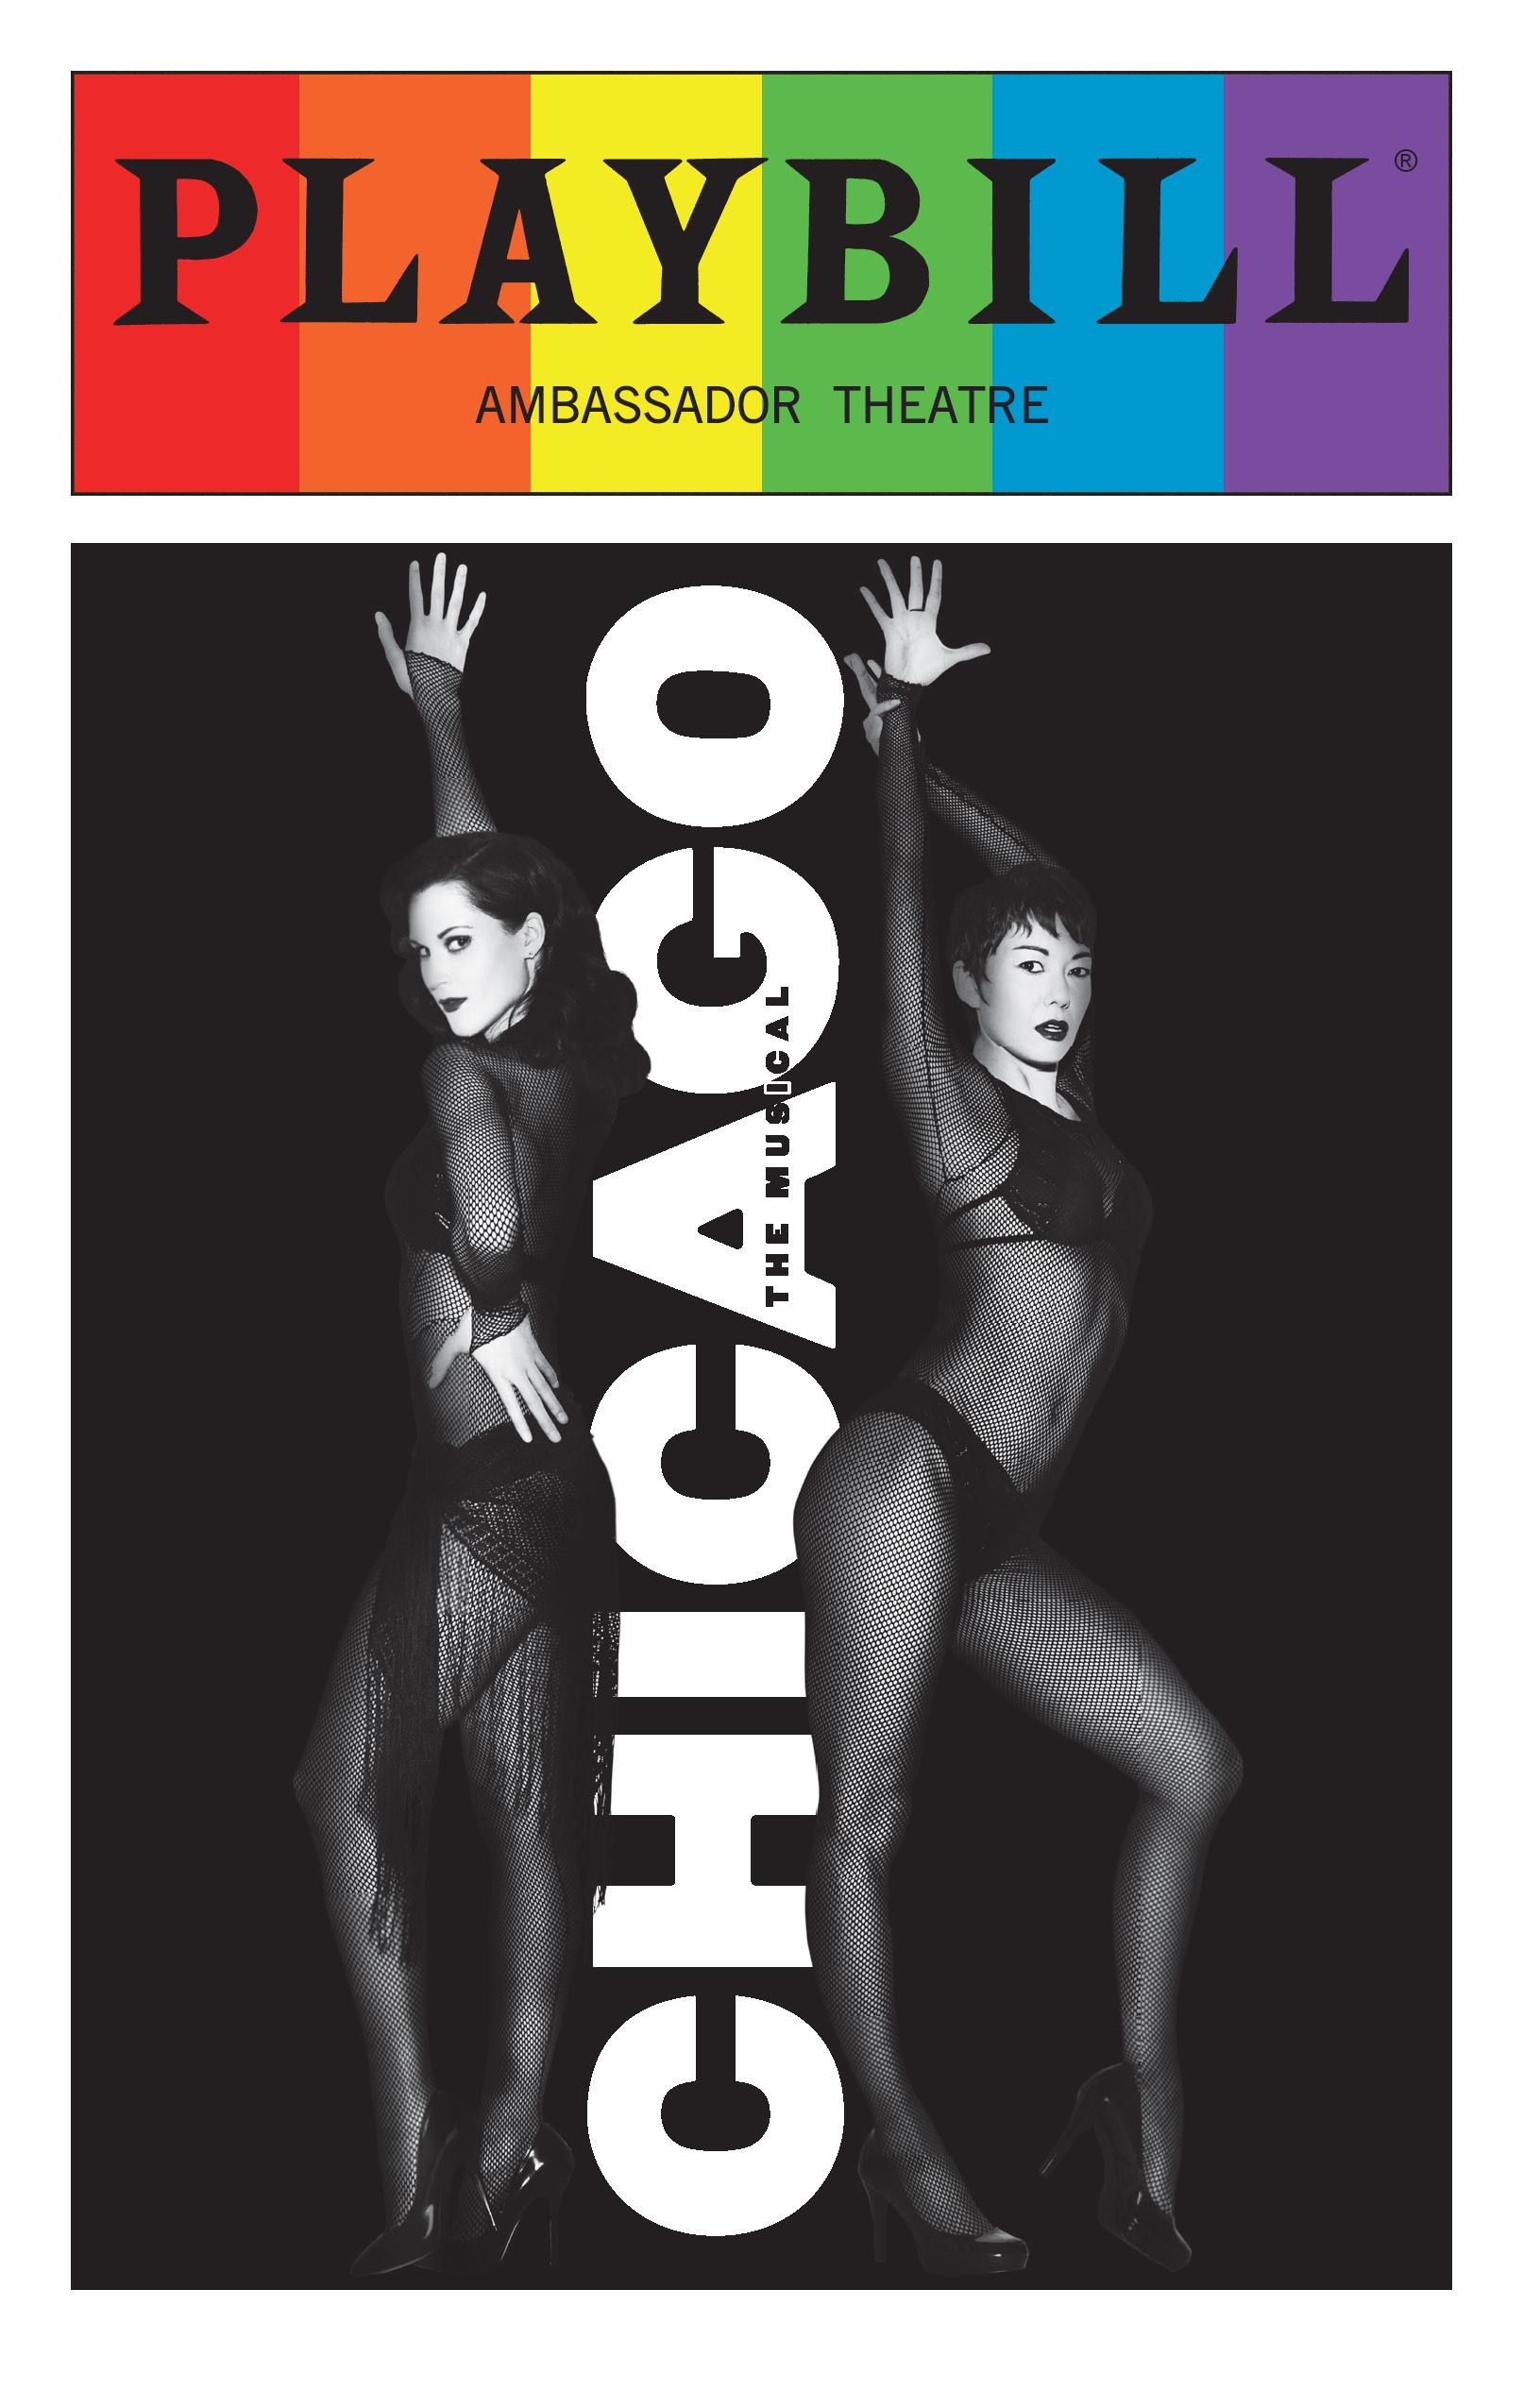 Chicago June 2016 Playbill With Rainbow Pride Logo